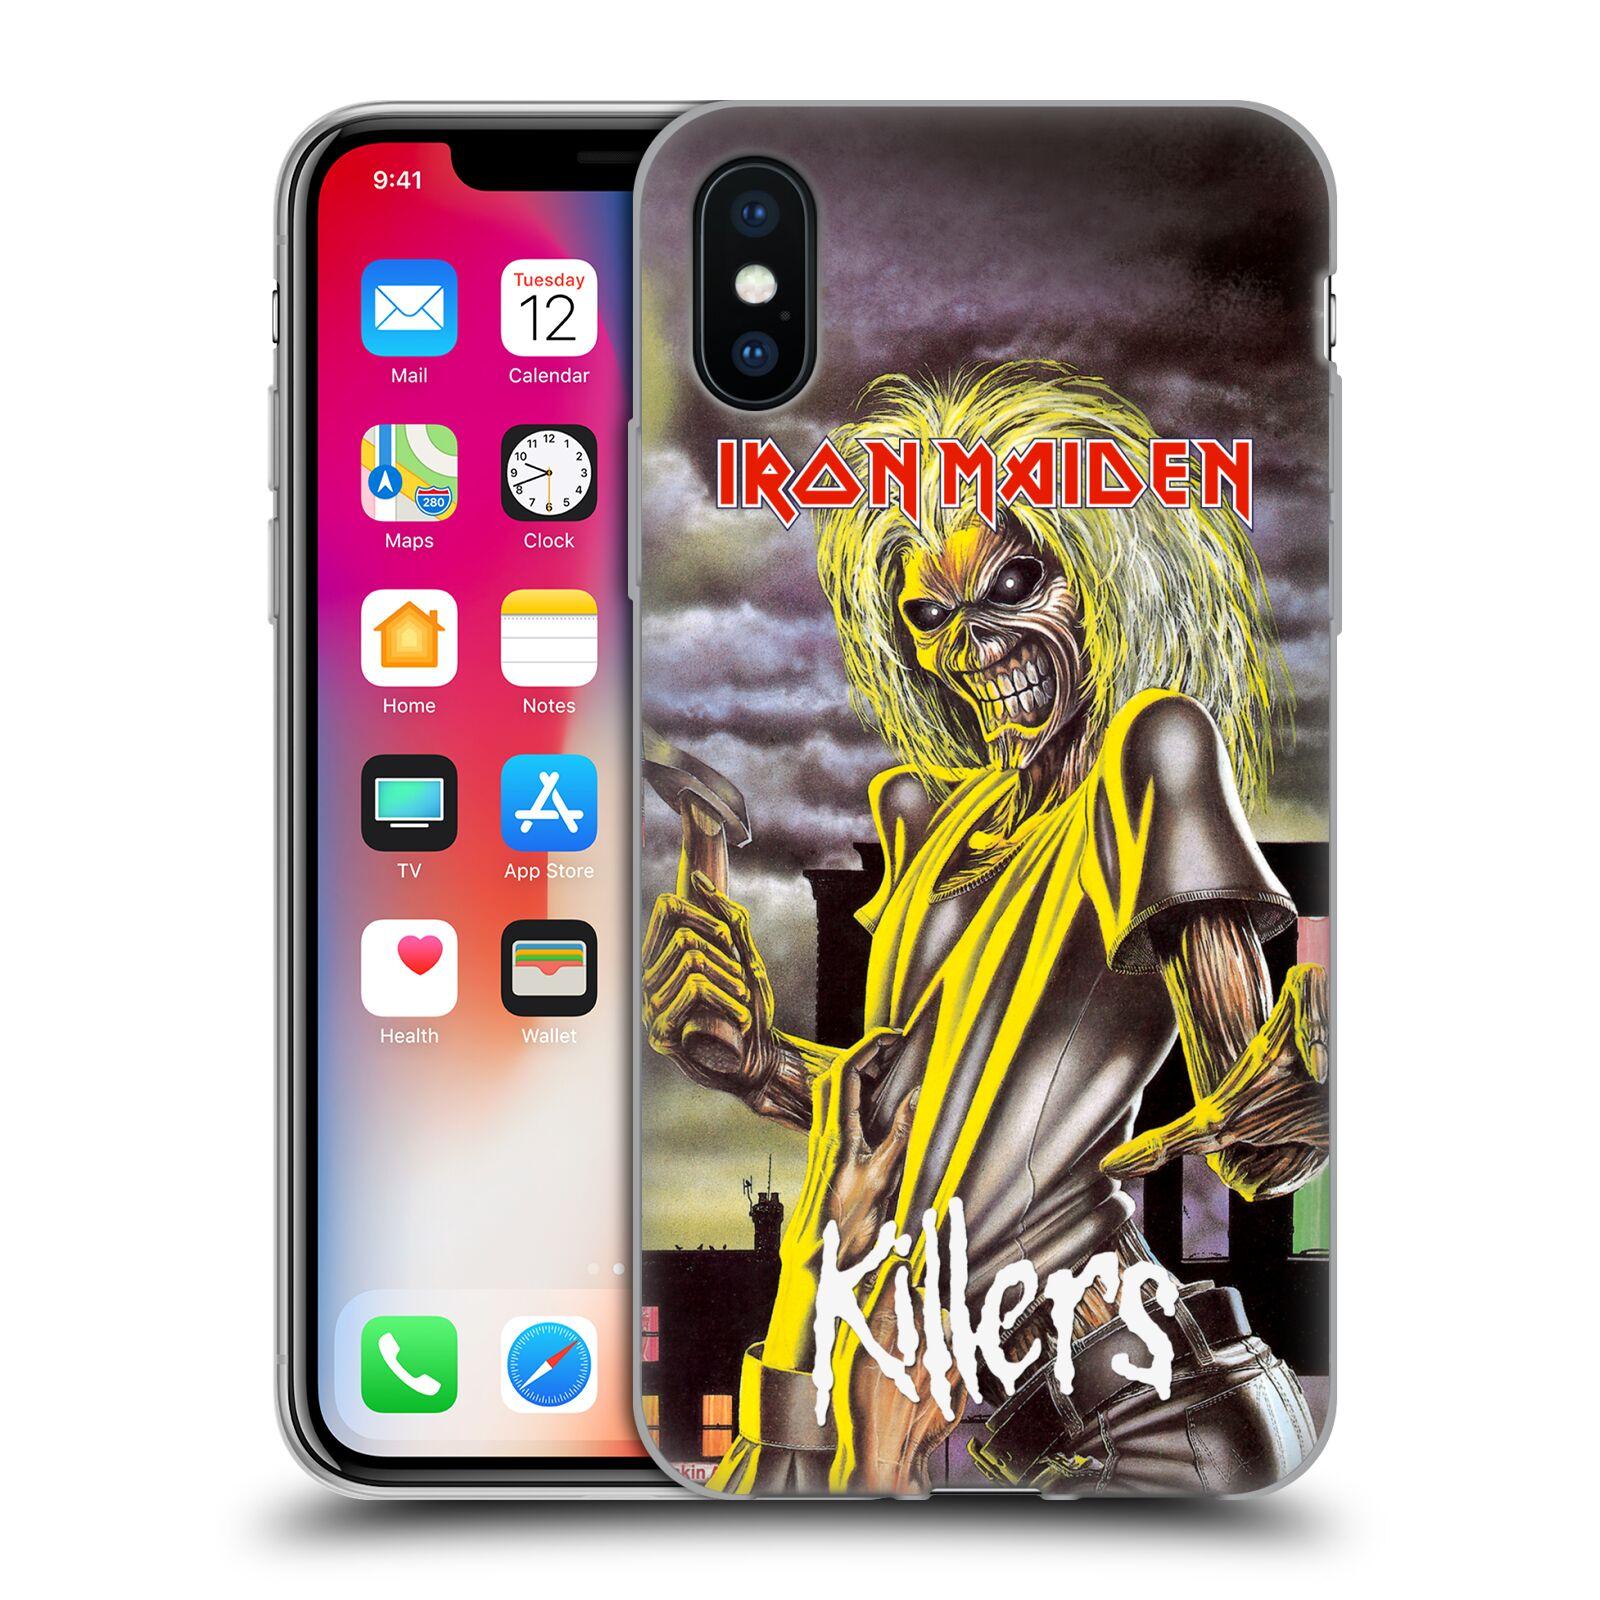 Silikonové pouzdro na mobil Apple iPhone XS - Head Case - Iron Maiden -  Killers ( 78b44420a79